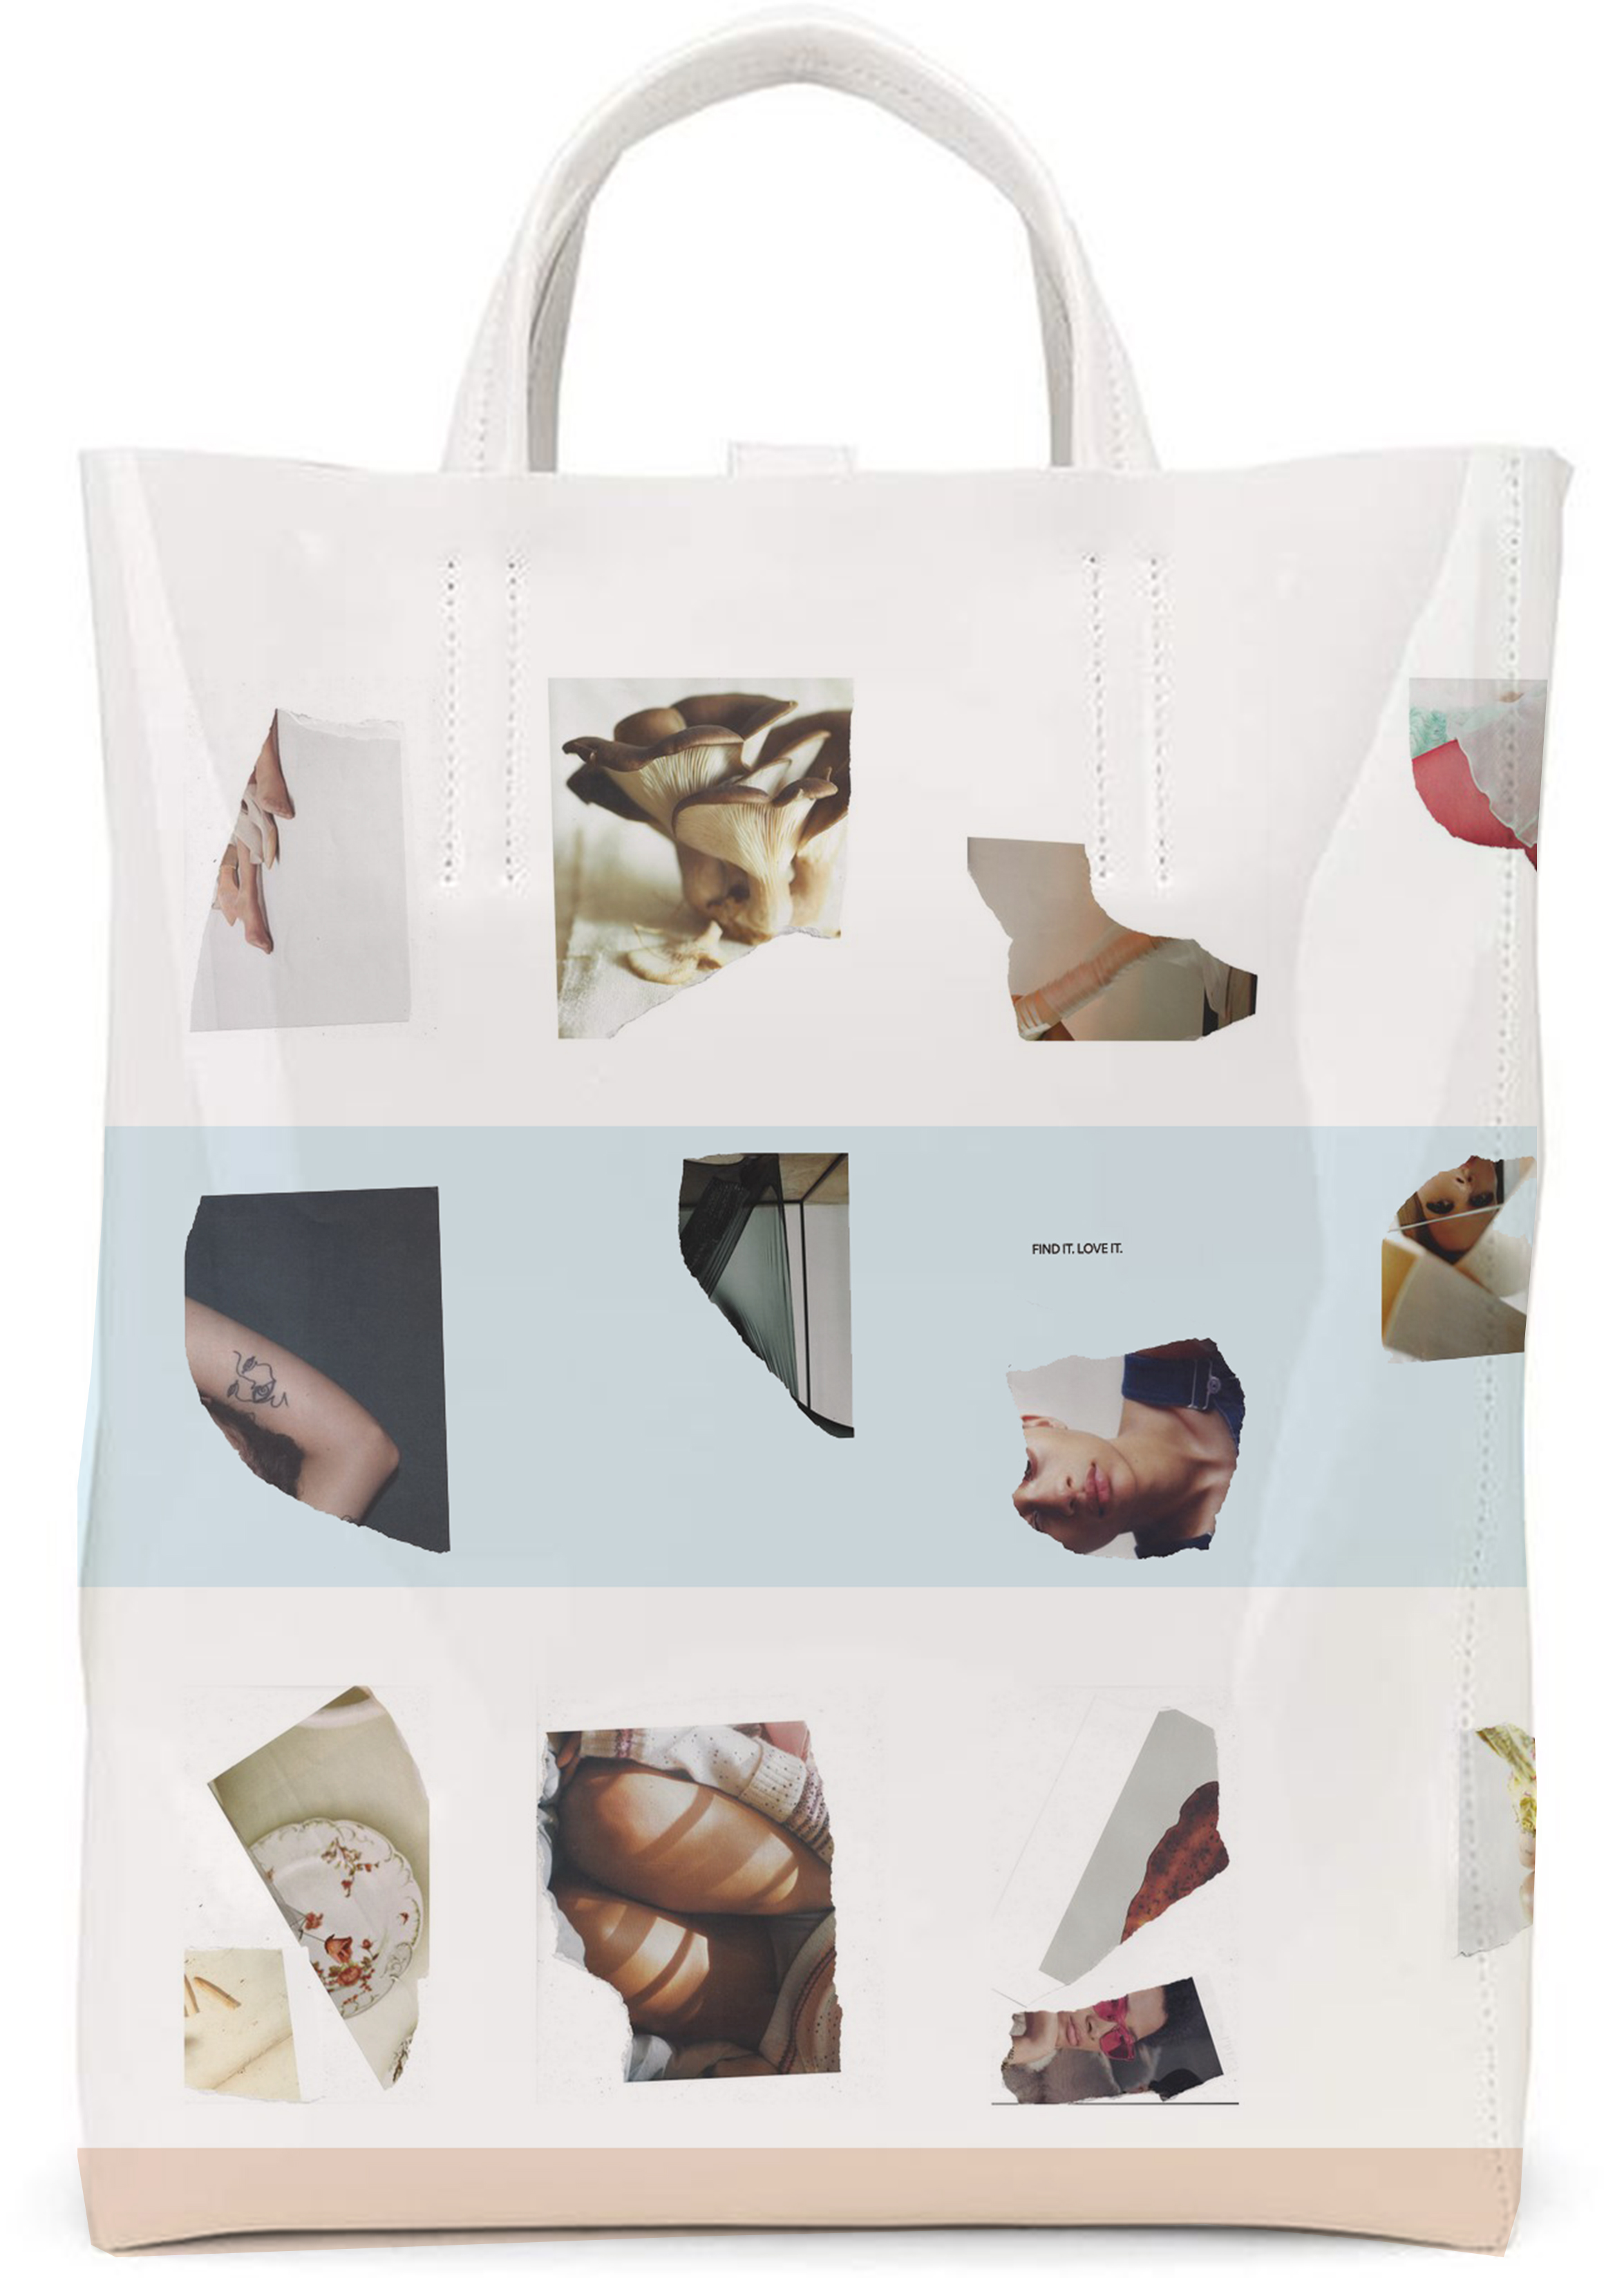 New handbag design 2A yes colorblack.jpg